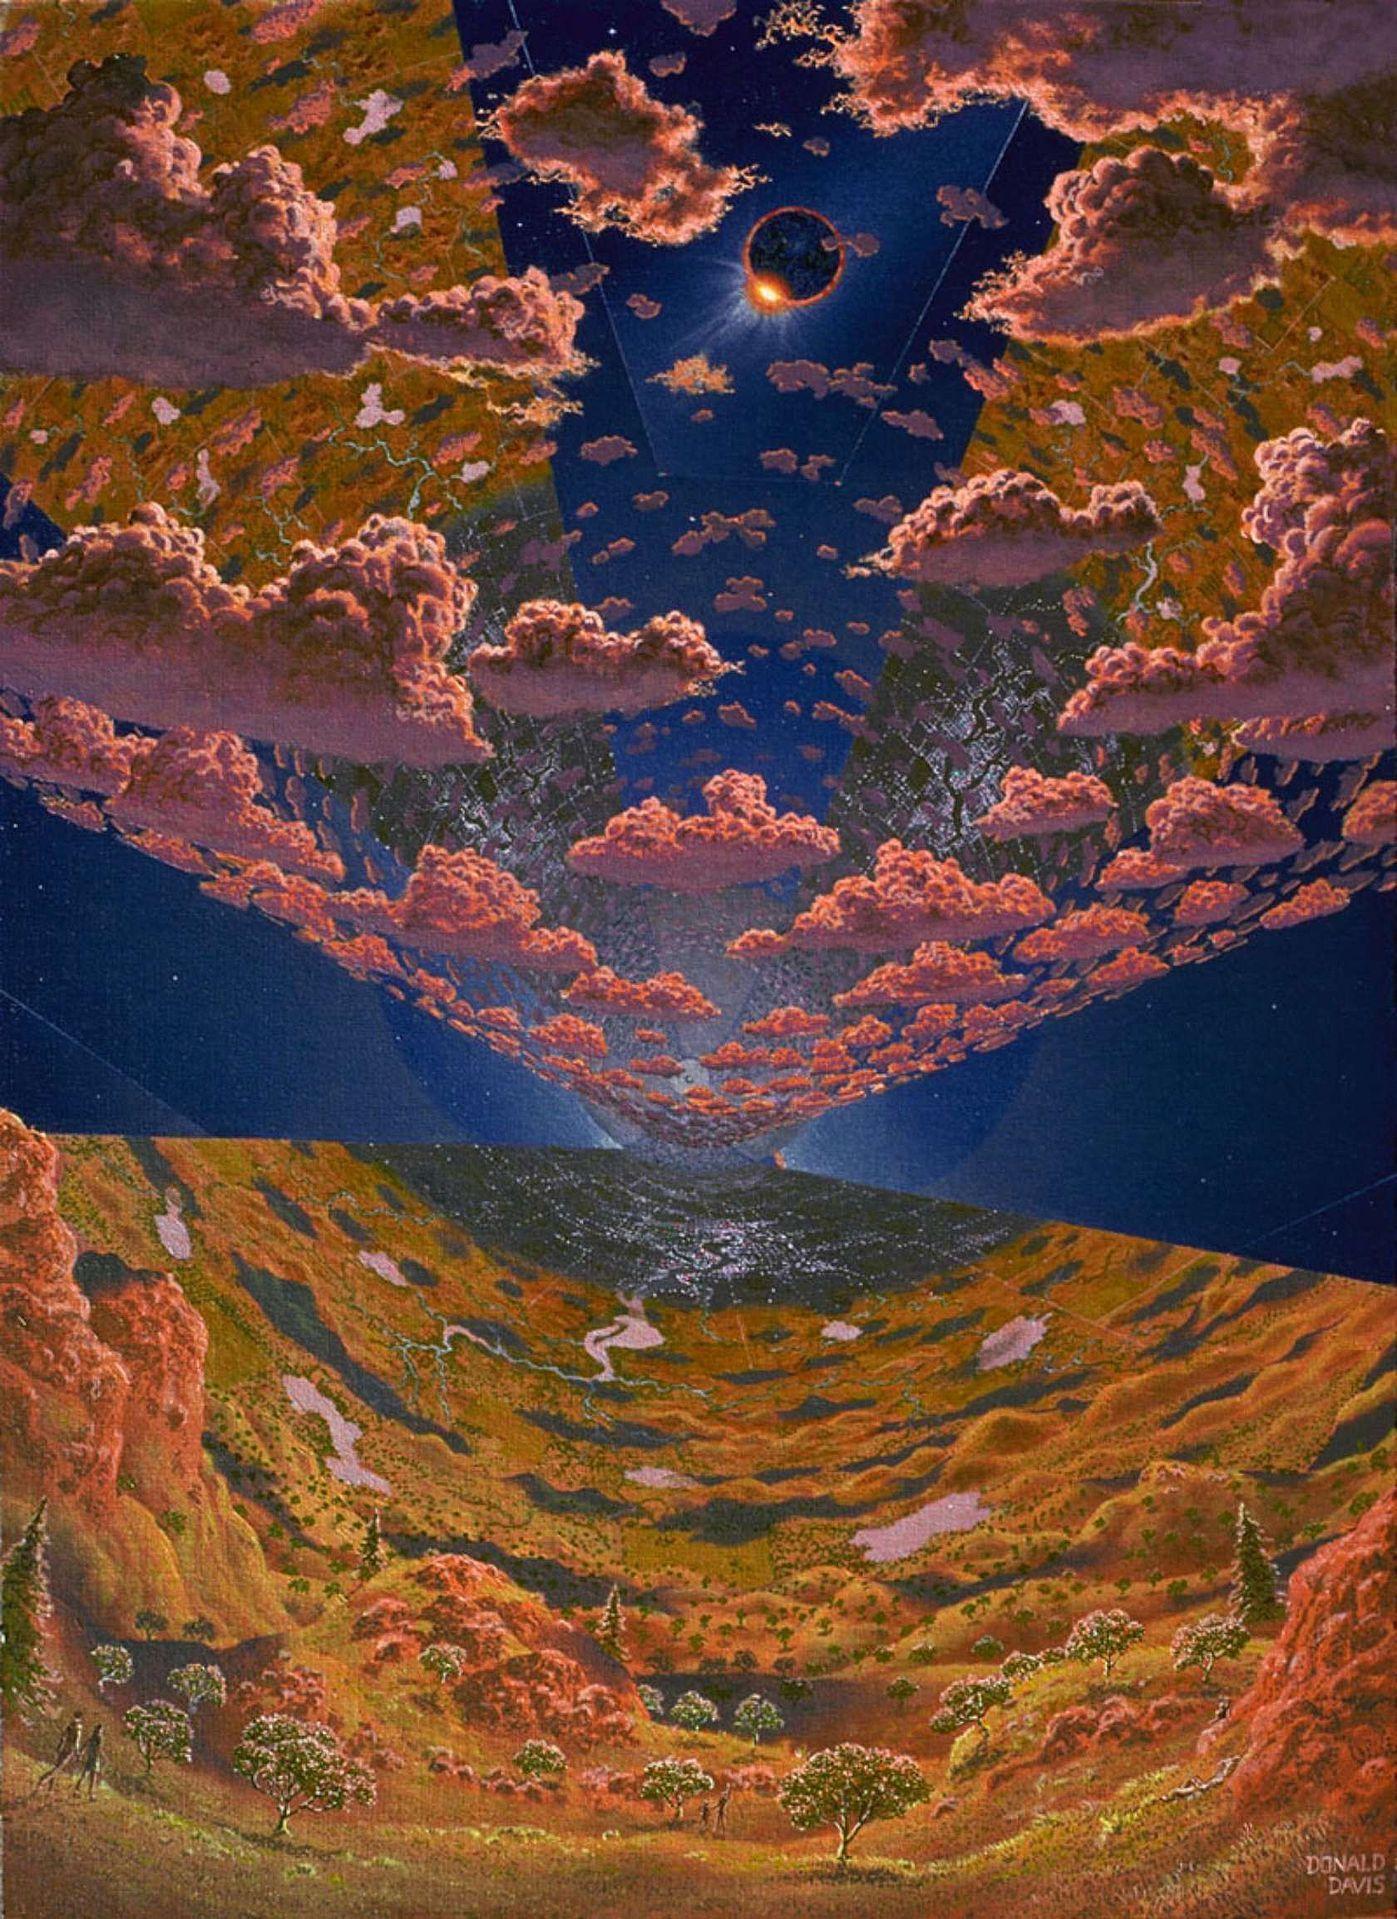 Les Villes De L Espace Wikipedia Art Spatial Fond D Ecran Science Fiction Art Science Fiction